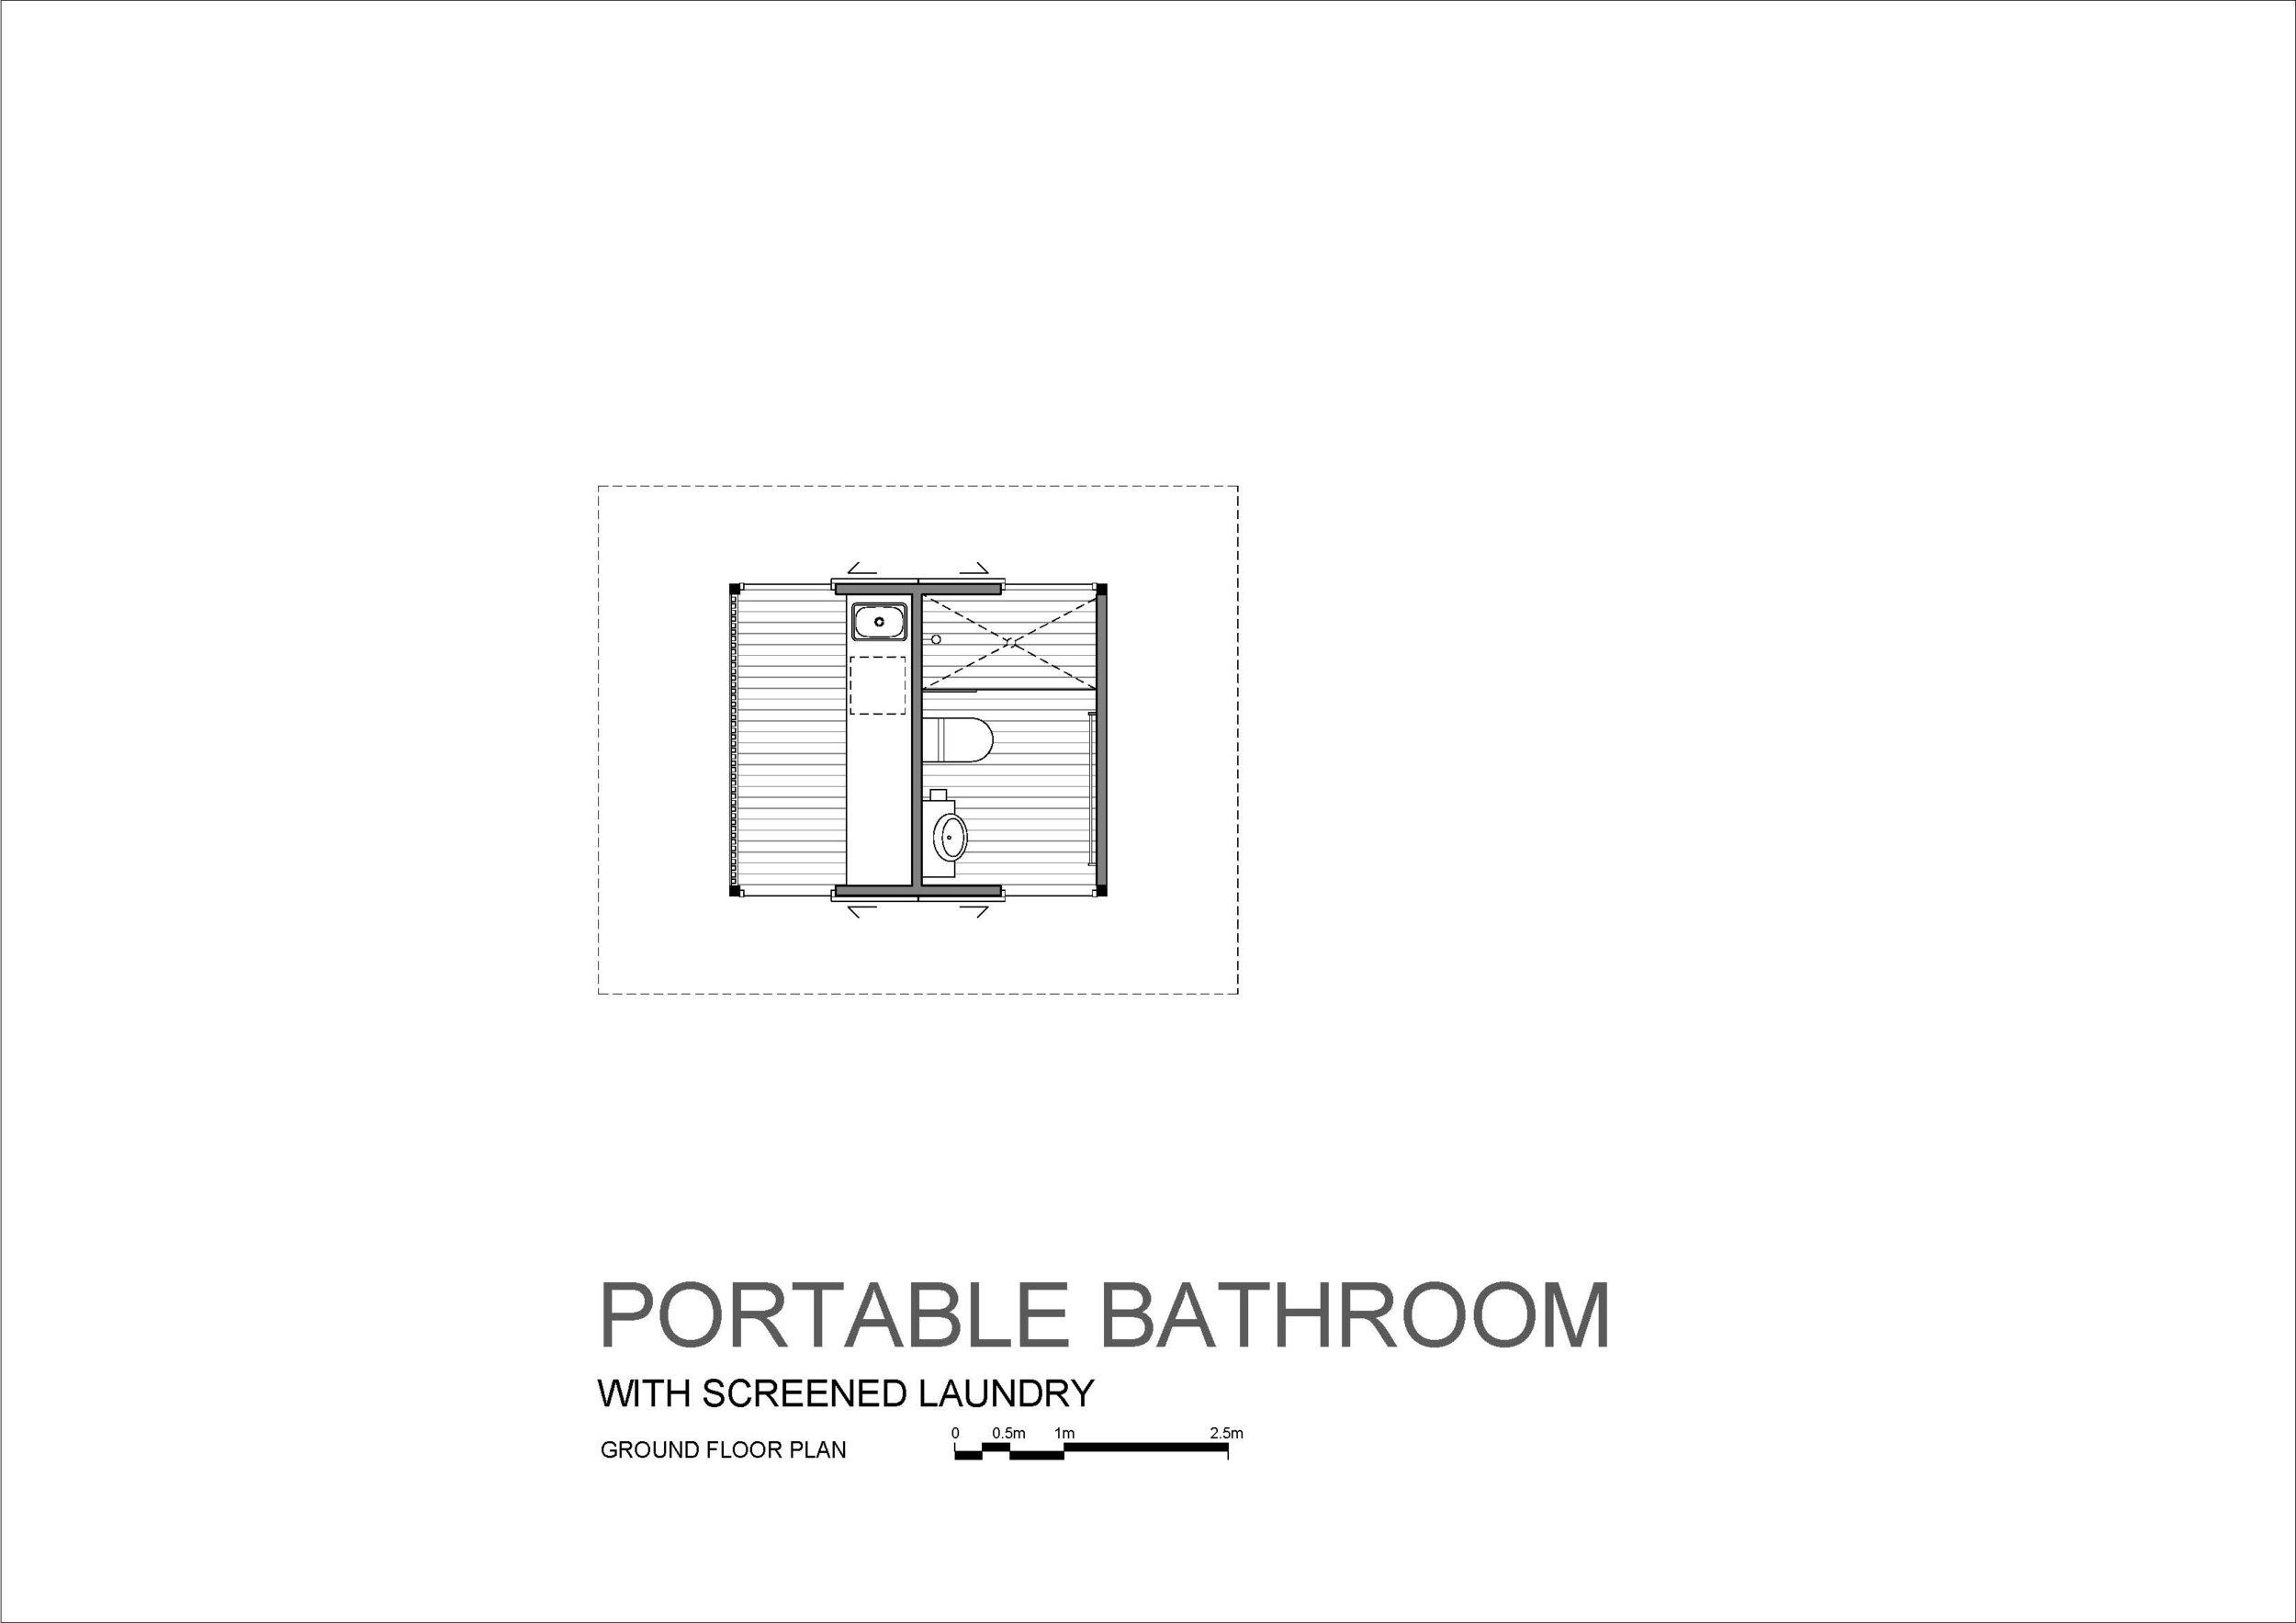 PORTABLE BATHROOM_Page_2.jpg